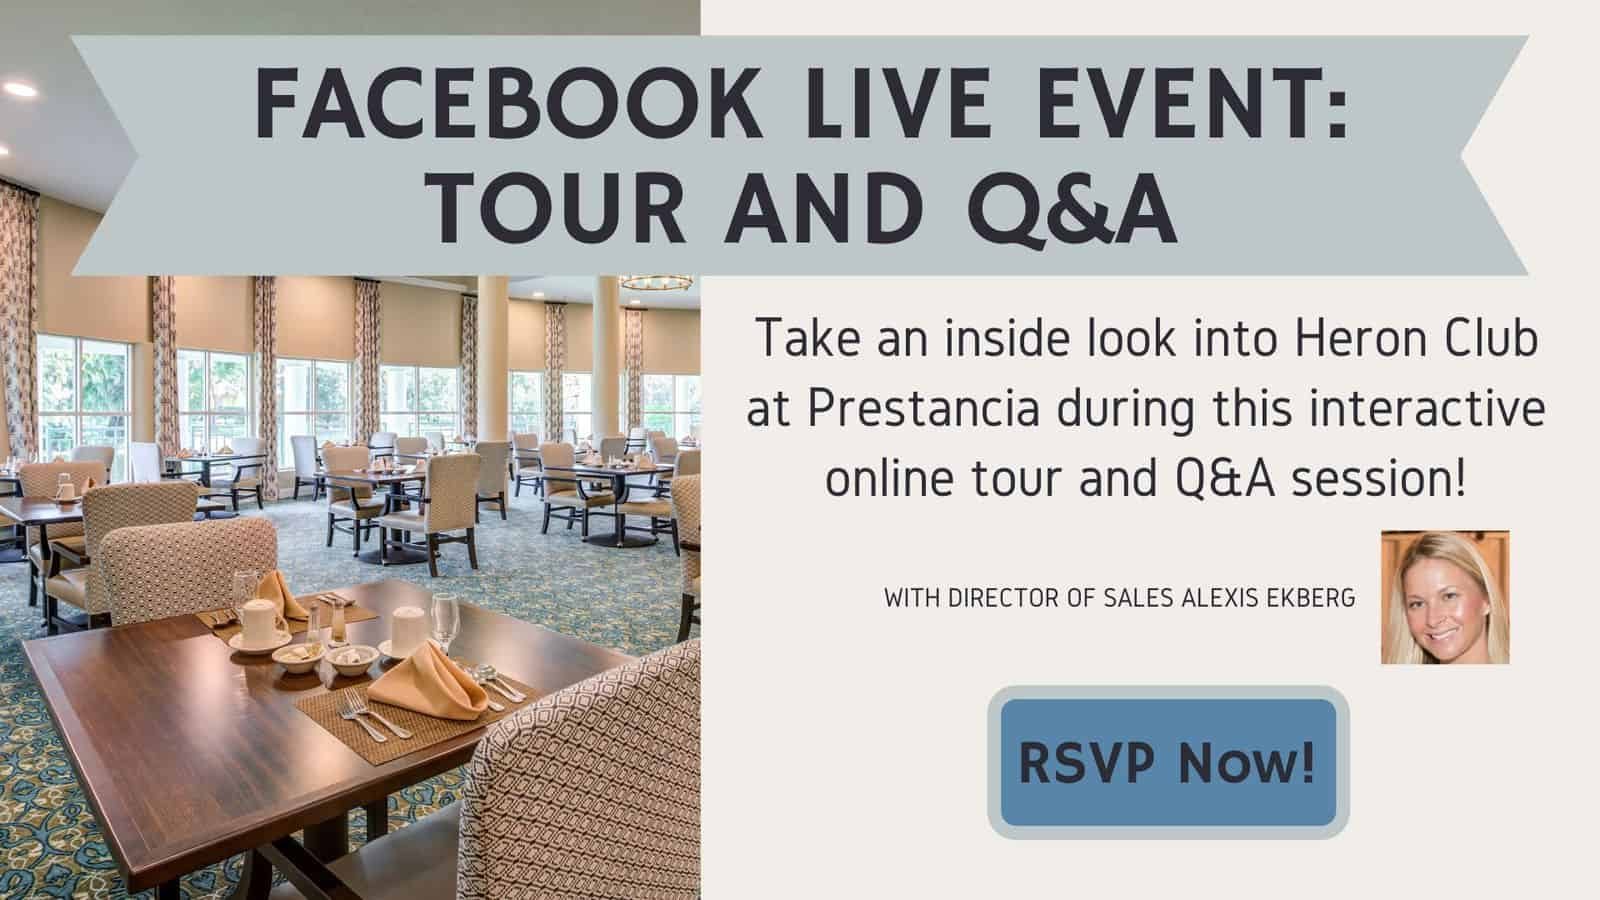 Facebook Live Event: Tour And Q&A – April 16th, 2020